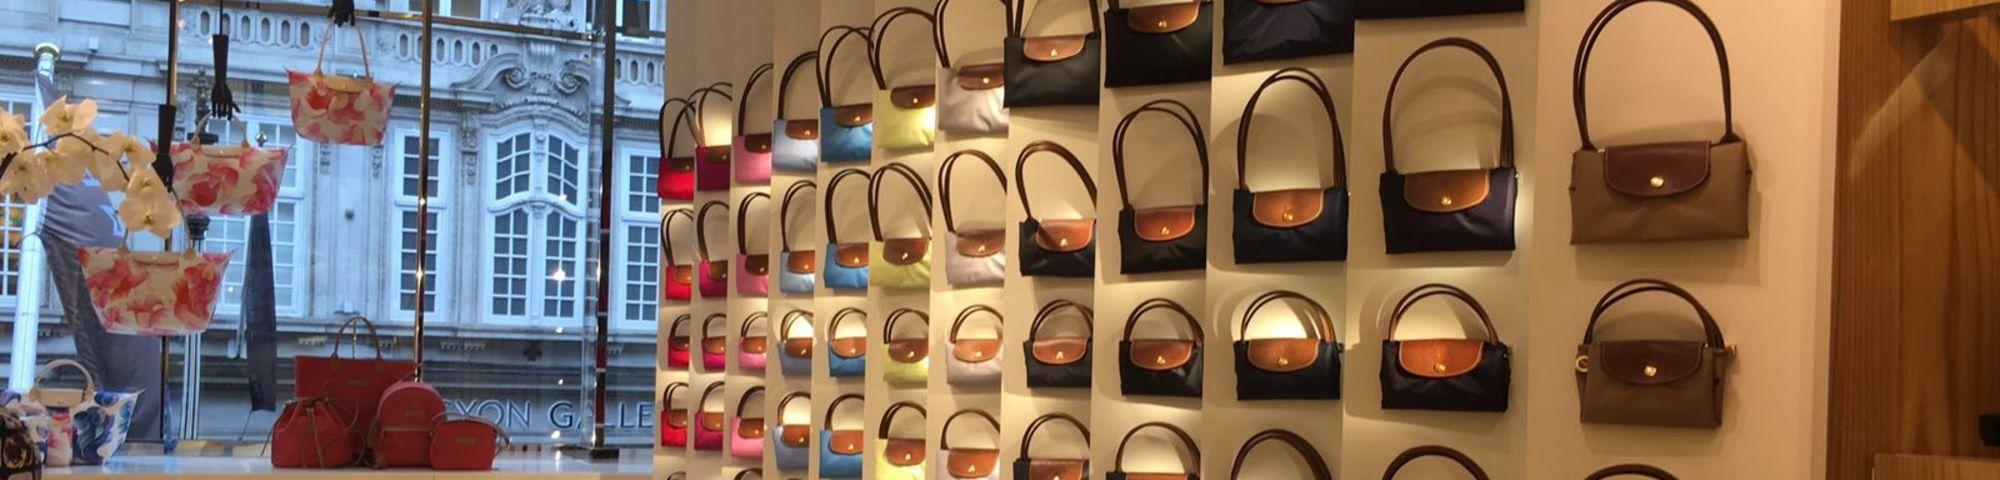 0ec240d104608 Guest post  A visit to the Longchamp London Flagship Store by Paul ...